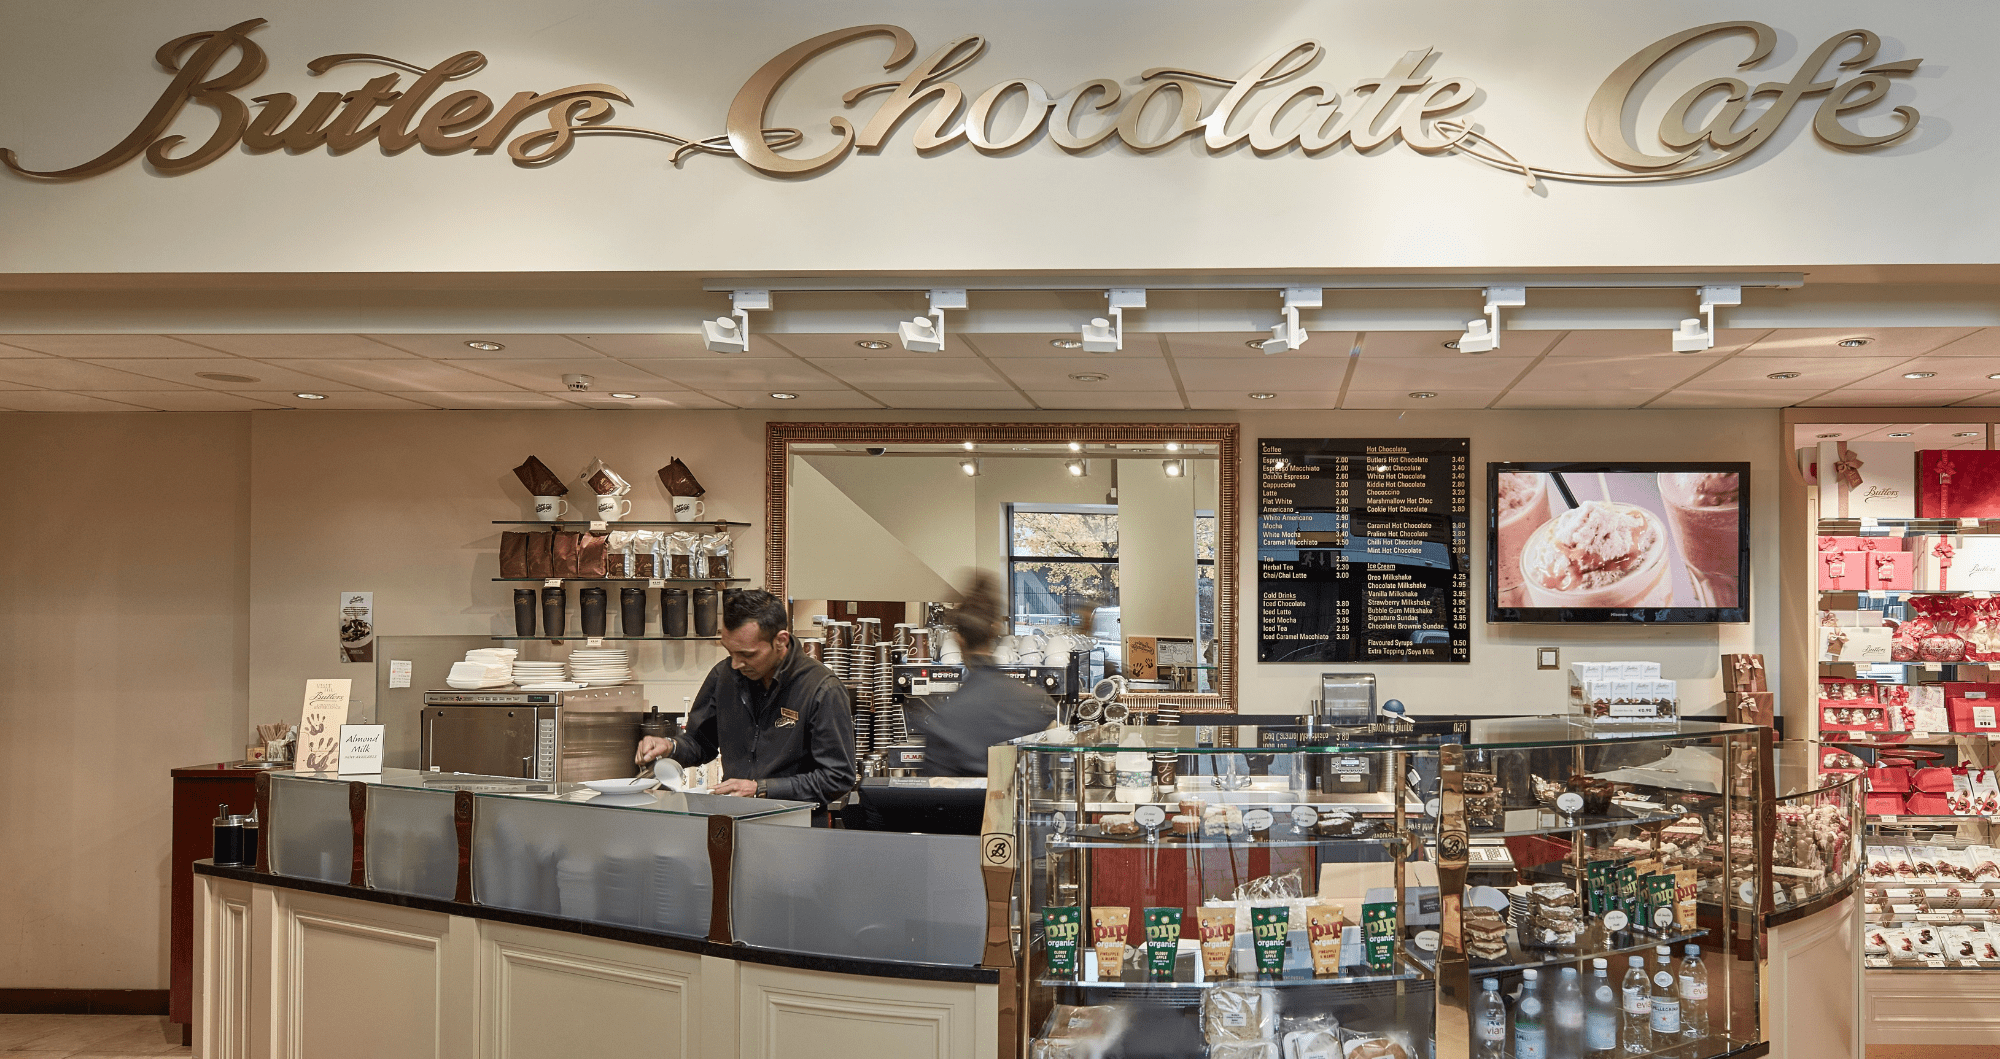 Butlers Chocolate Café, Clonshaugh